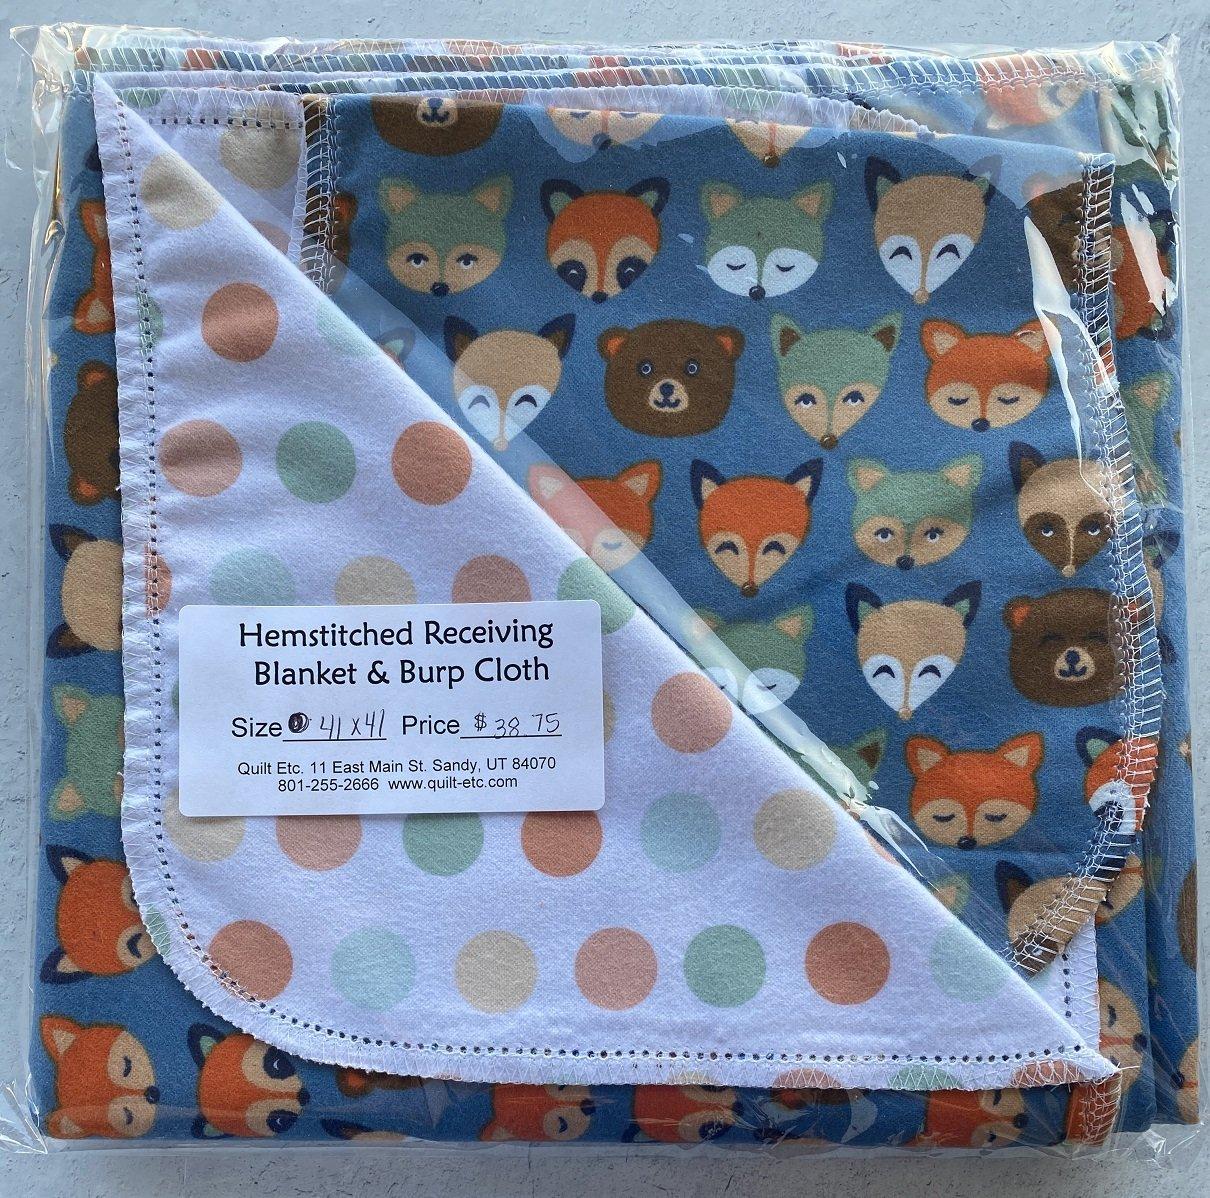 Hemstitched Receiving Blanket & Burp Cloth 10